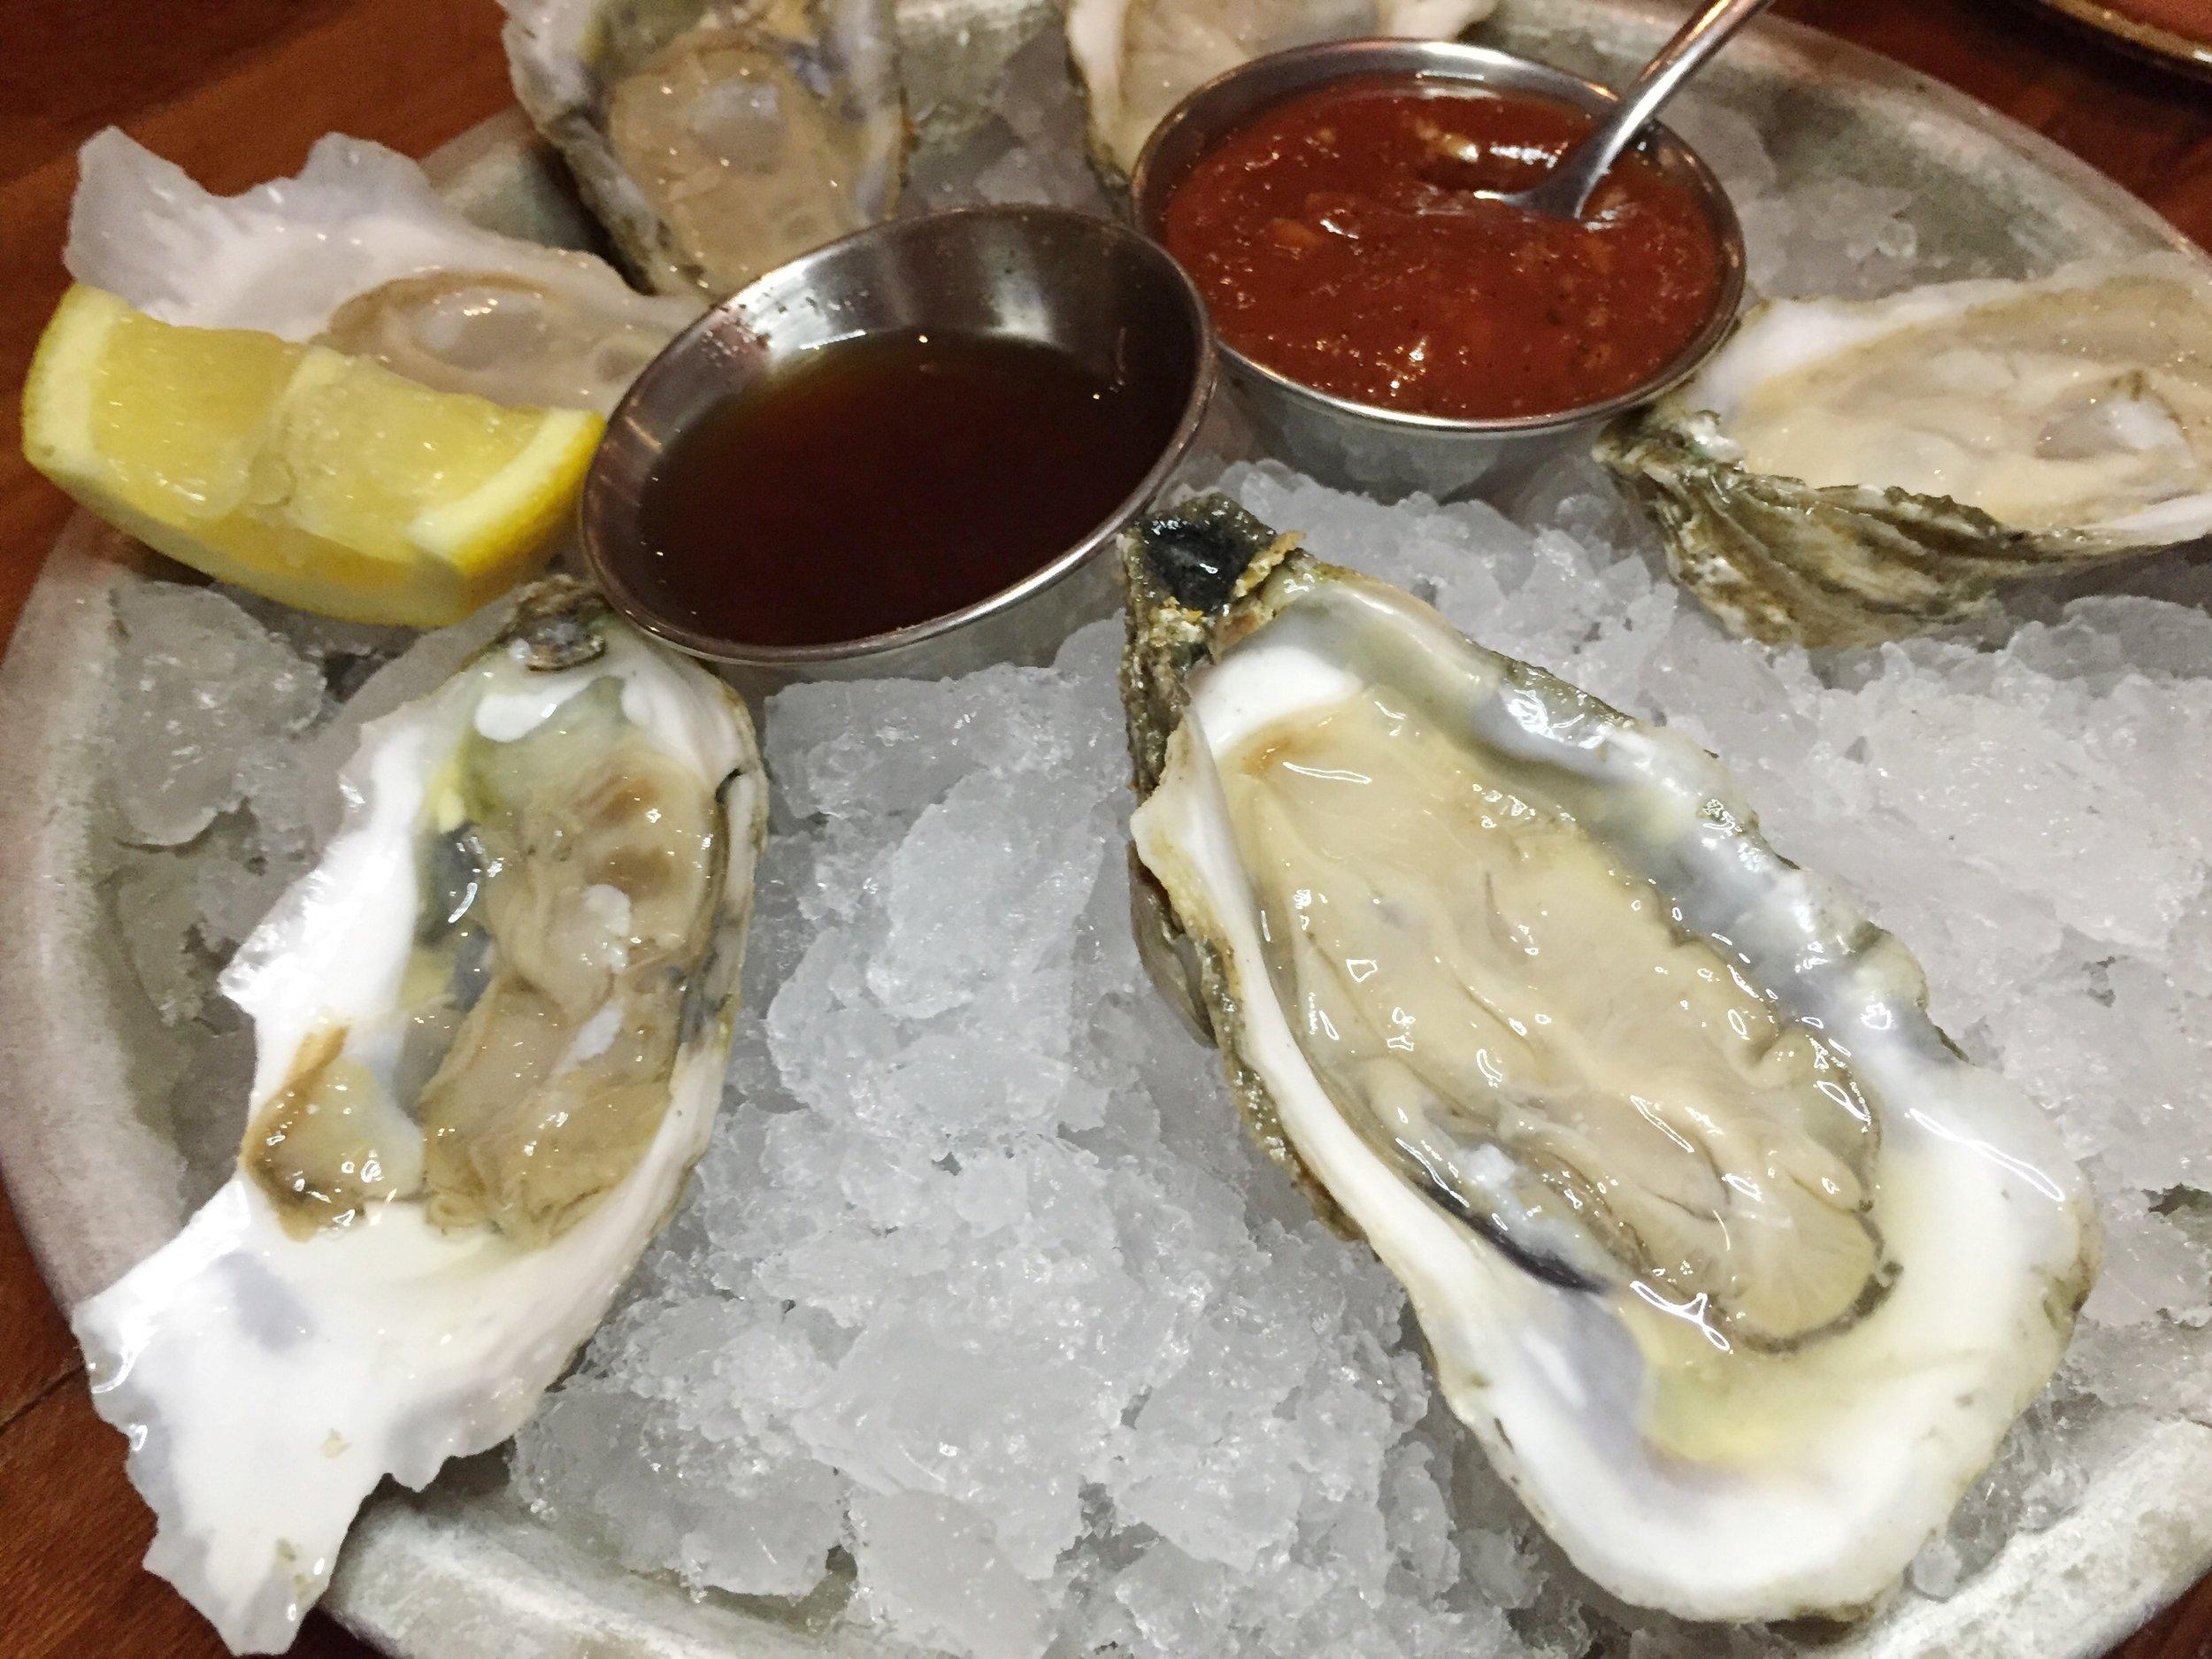 Rappahannock (Topping, VA), Rochambeu (Yorktown, VA), Olde Salts (Chincoteague, VA)